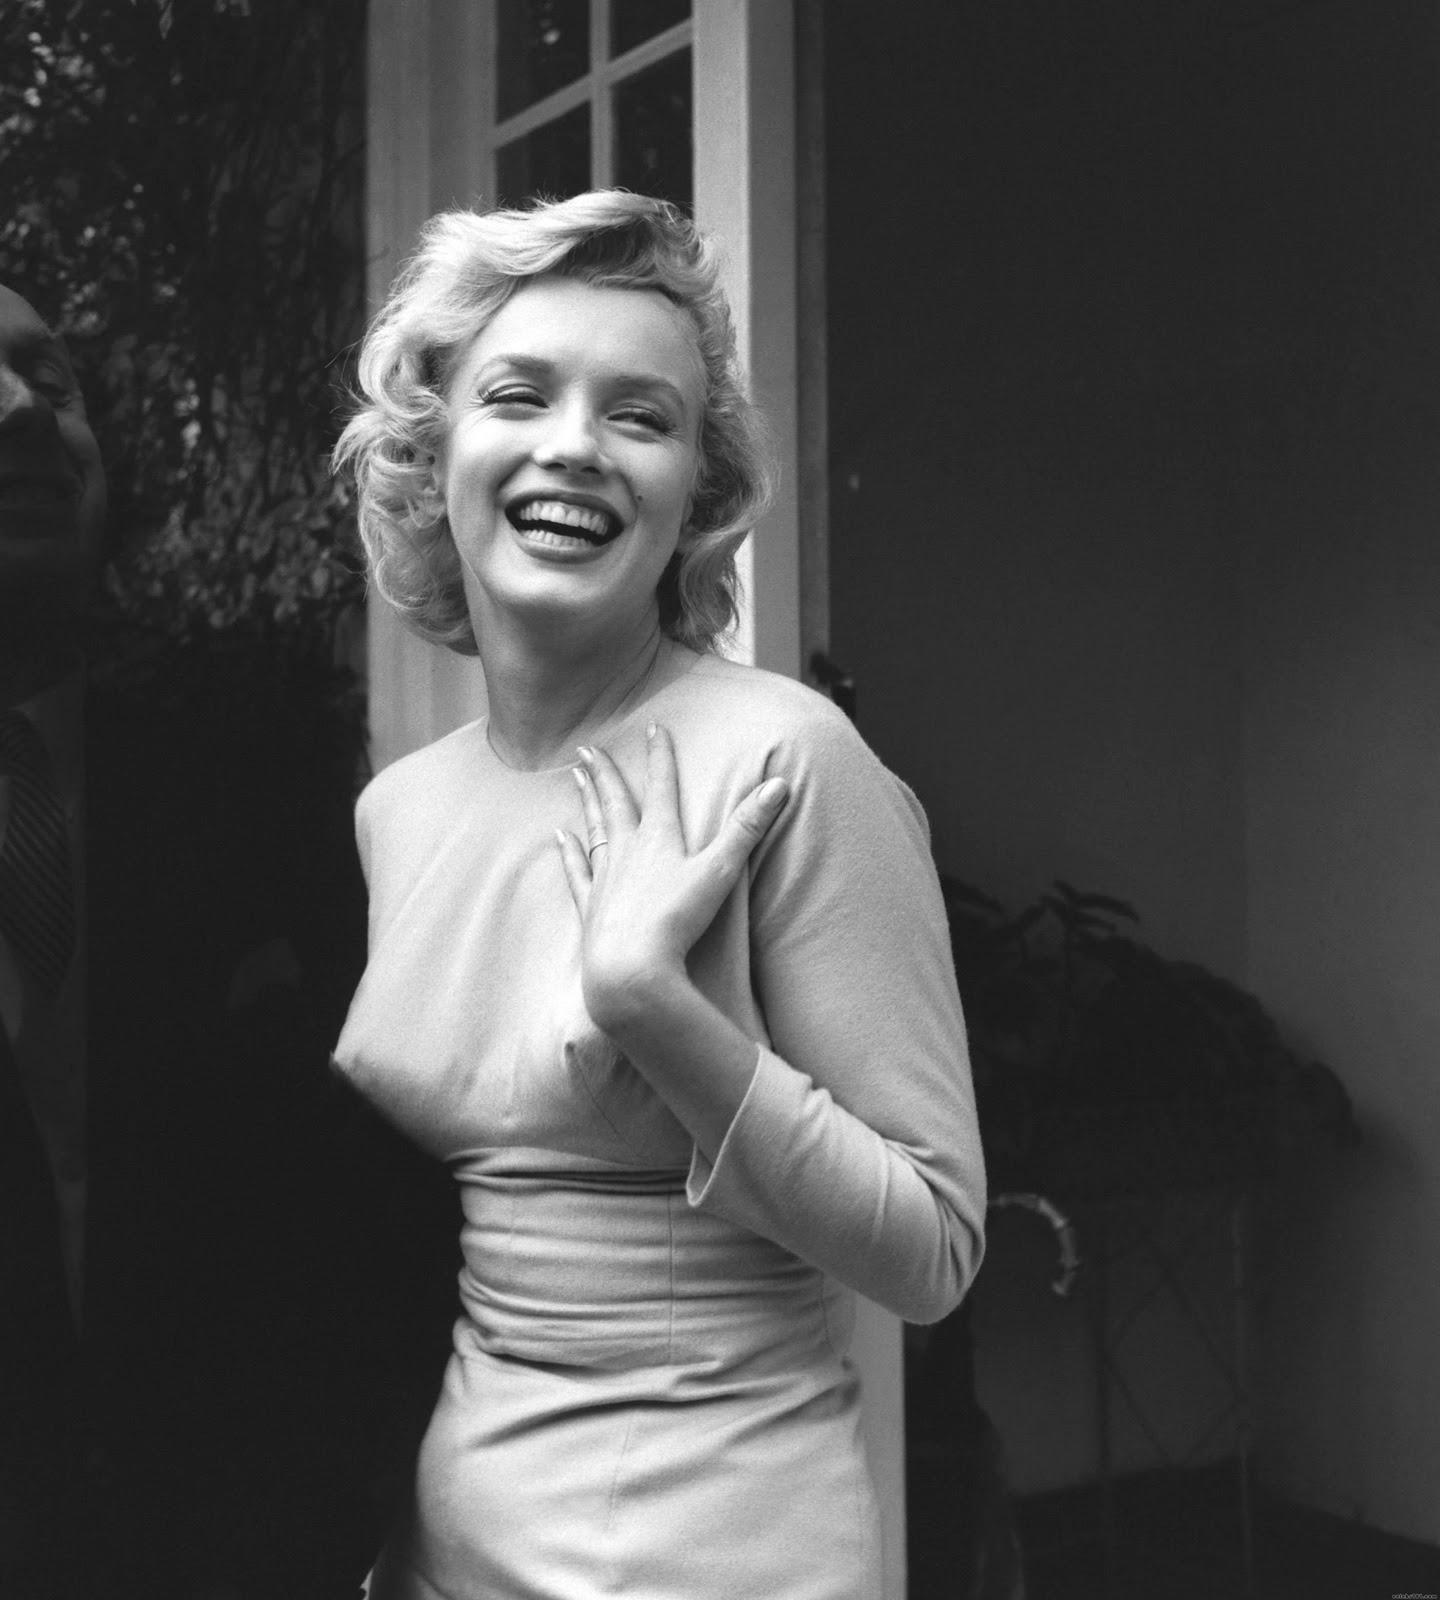 http://4.bp.blogspot.com/-WGsX74mBKr4/Tx8ITZ0w7xI/AAAAAAAACbE/BBc8rjrcD1E/s1600/Marilyn_Monroe_72.jpg